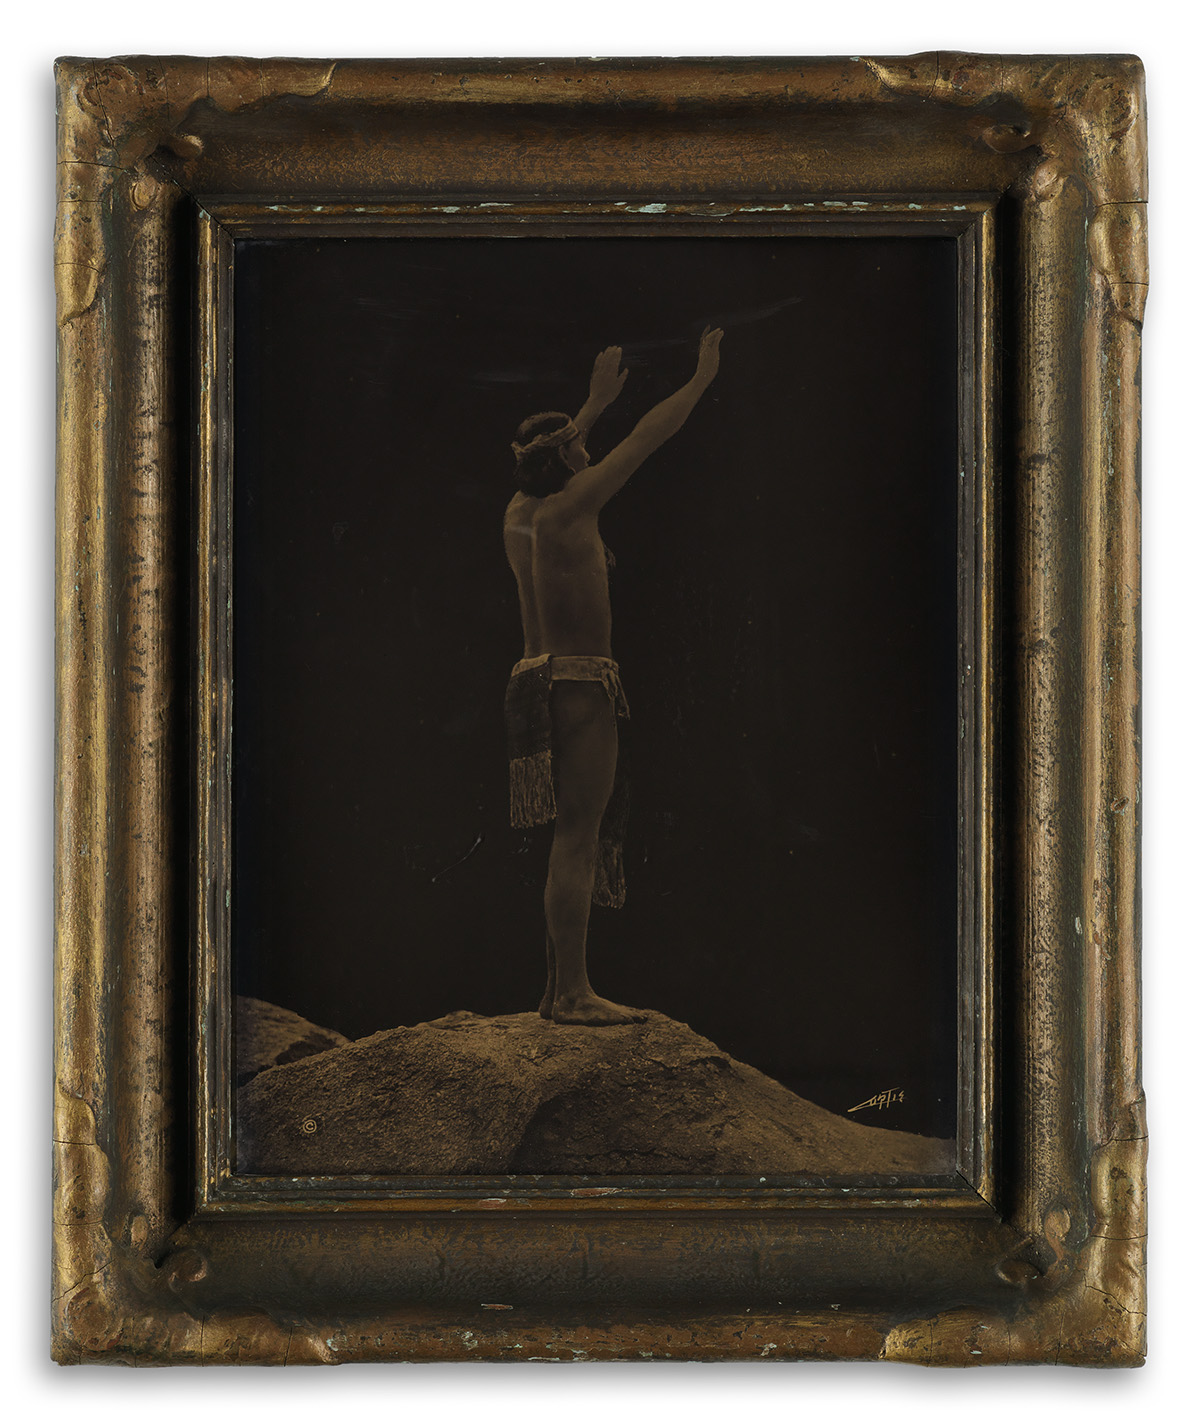 EDWARD-S-CURTIS-(1868-1952)-Prayer-to-the-Stars